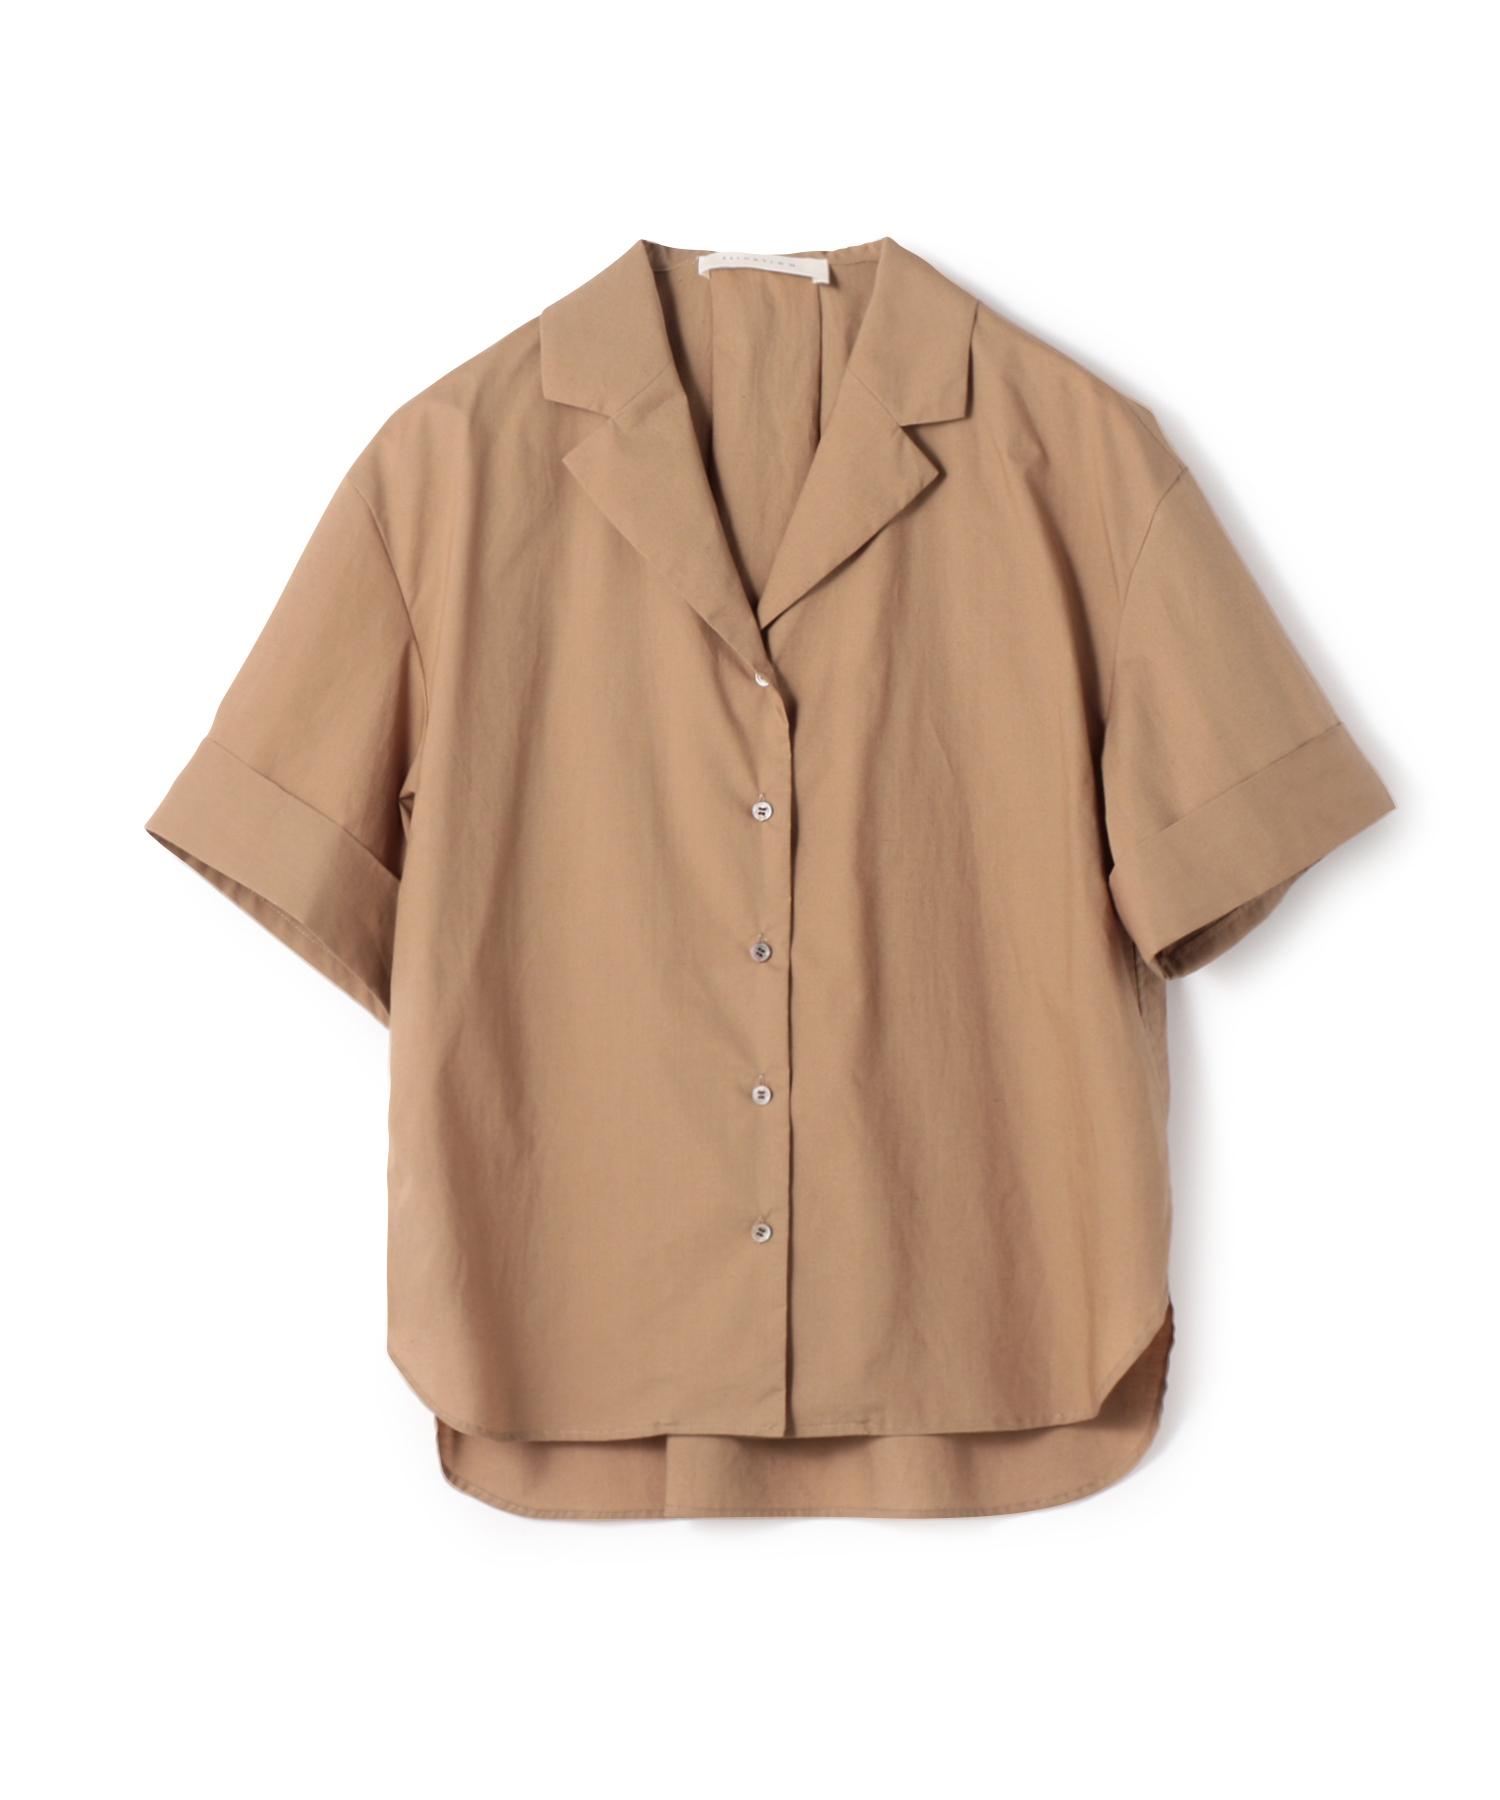 ESTNATION / エアリーコットンオープンカラーシャツ